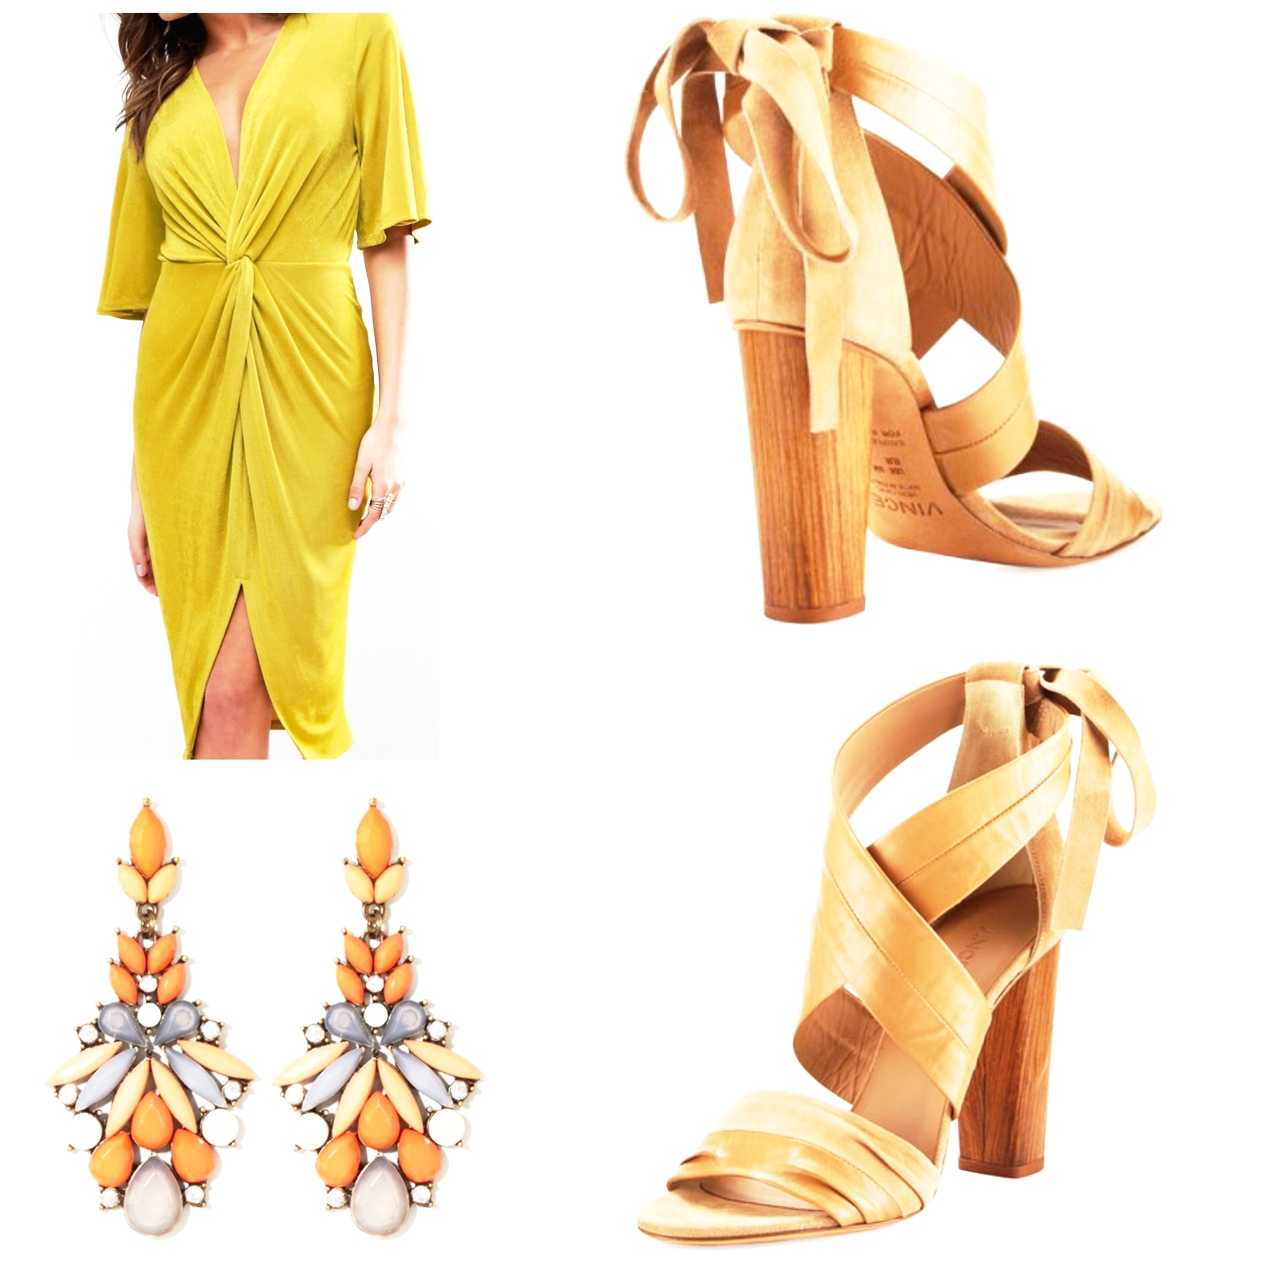 Vince Beatrice Wrap Sandal      Charming Charlie Earrings      Kimono Knot Front Dress